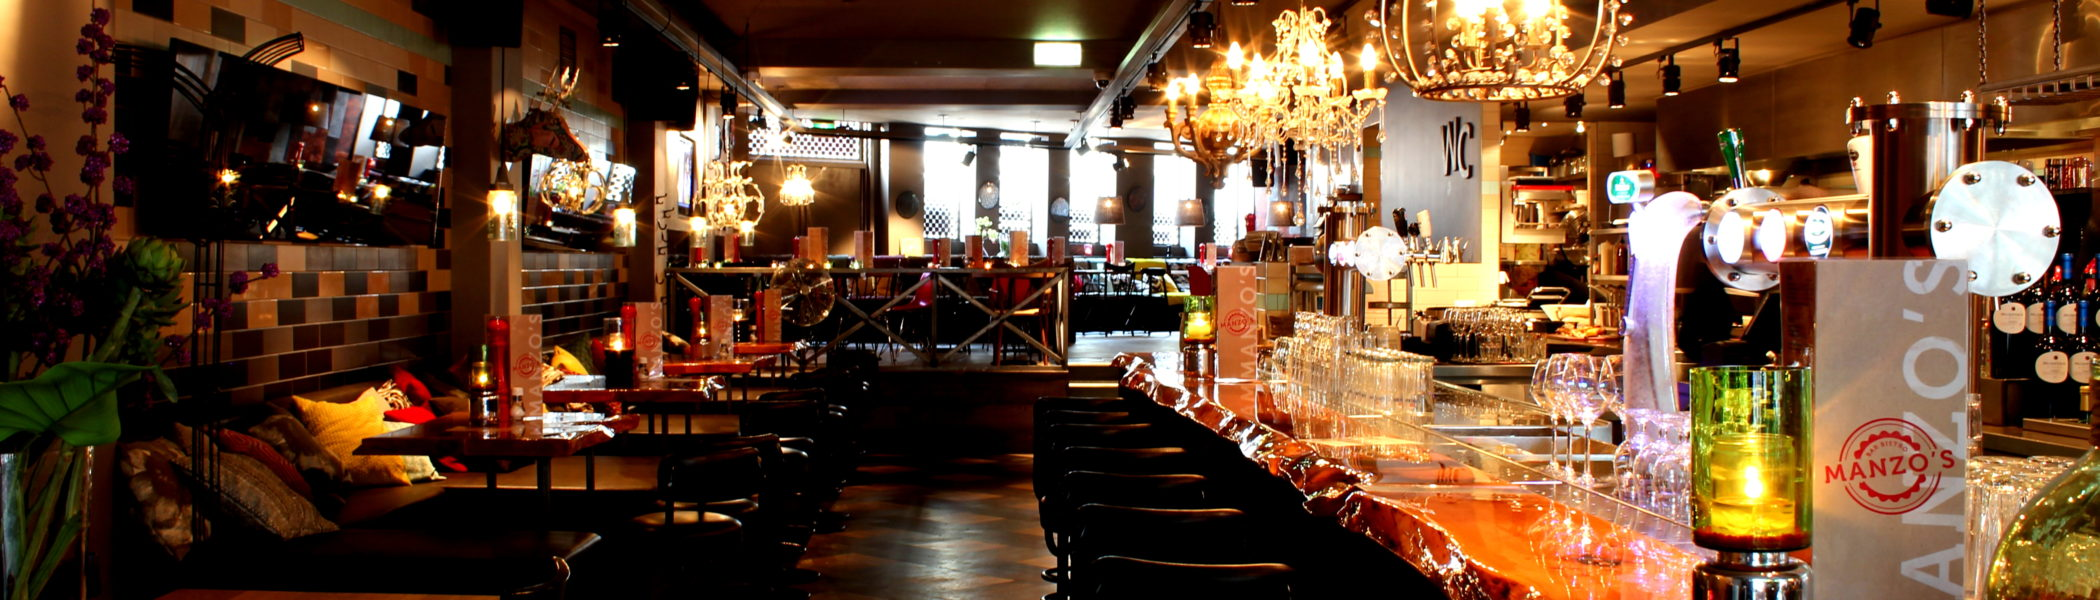 restaurant zaandam manzo bar bistro bar interieur sfeer